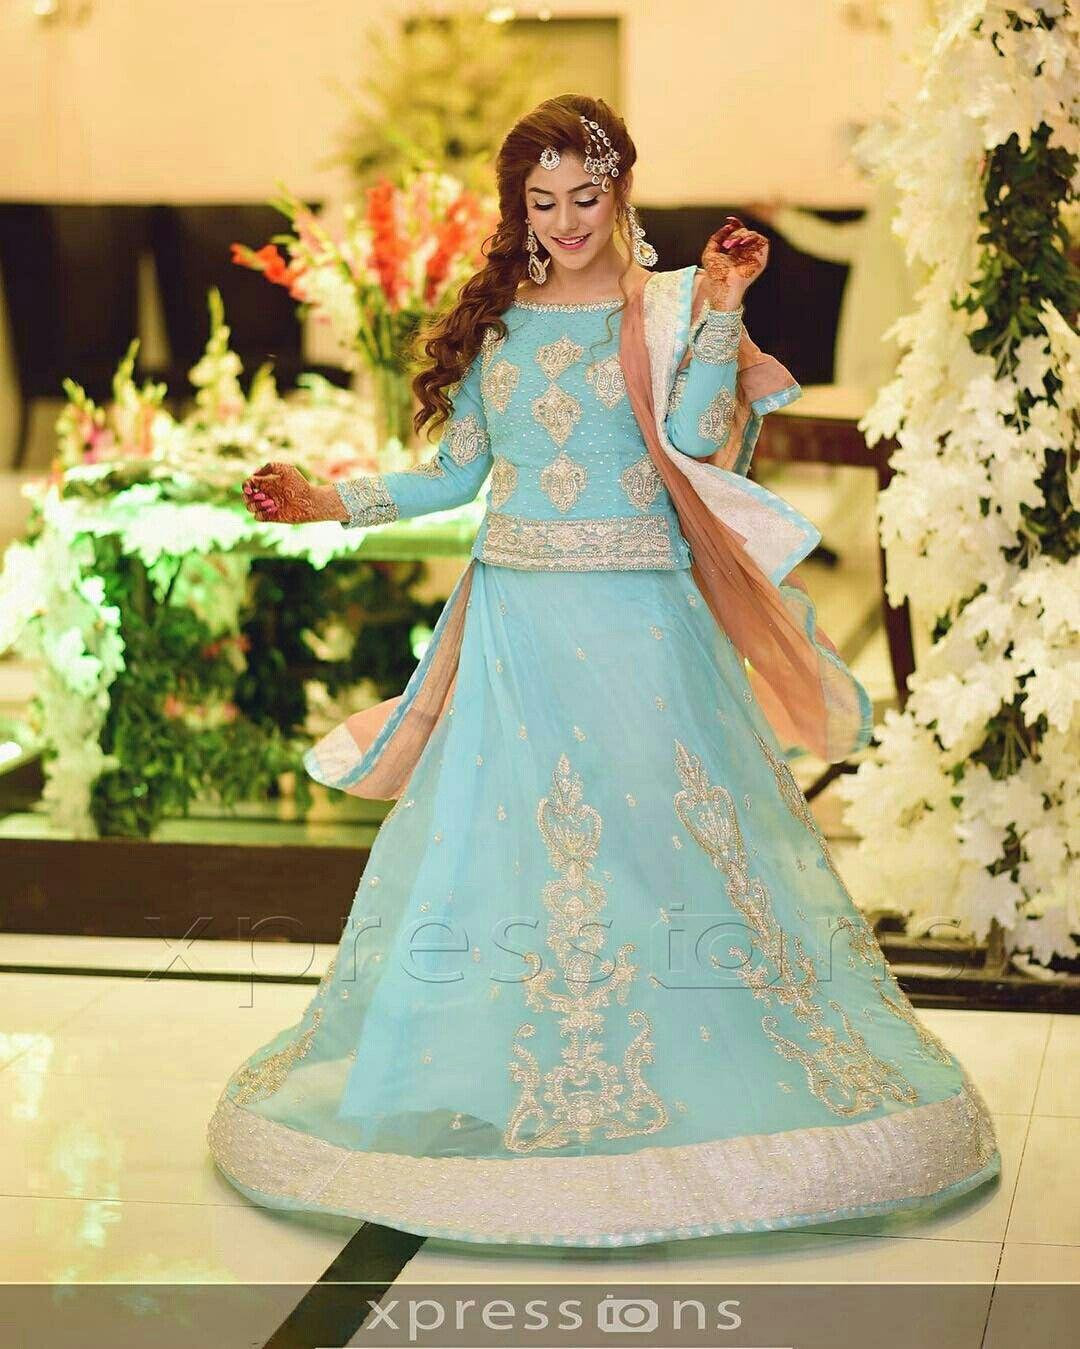 Pin by Zainab Tanveer on Fine Art and Umarish Weddings photography ...